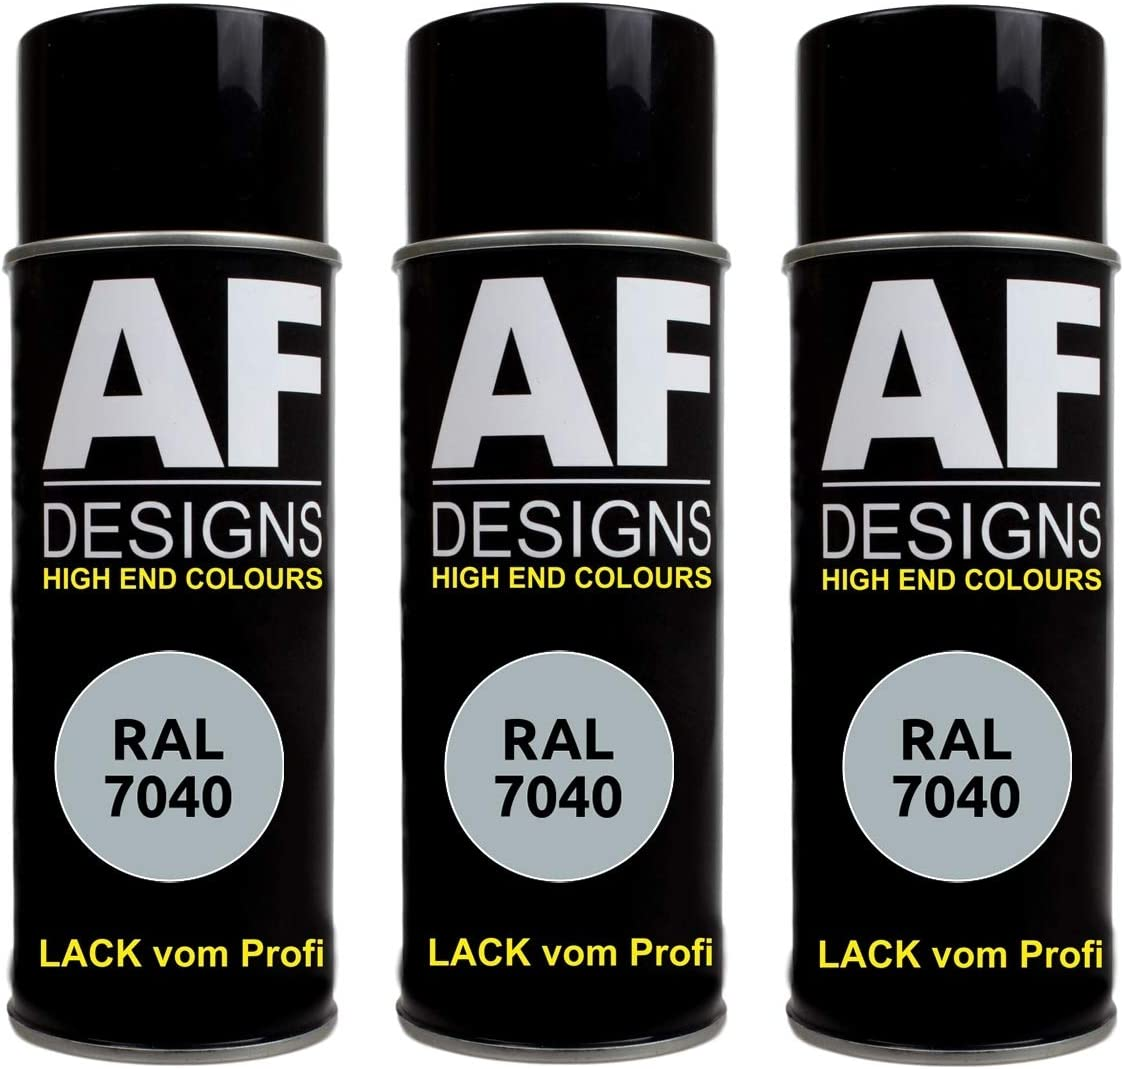 Alex Flittner Designs 3x Ral Lackspray Autolack Buntlack Spraydose Ral7040 Fenstergrau Glänzend Auto